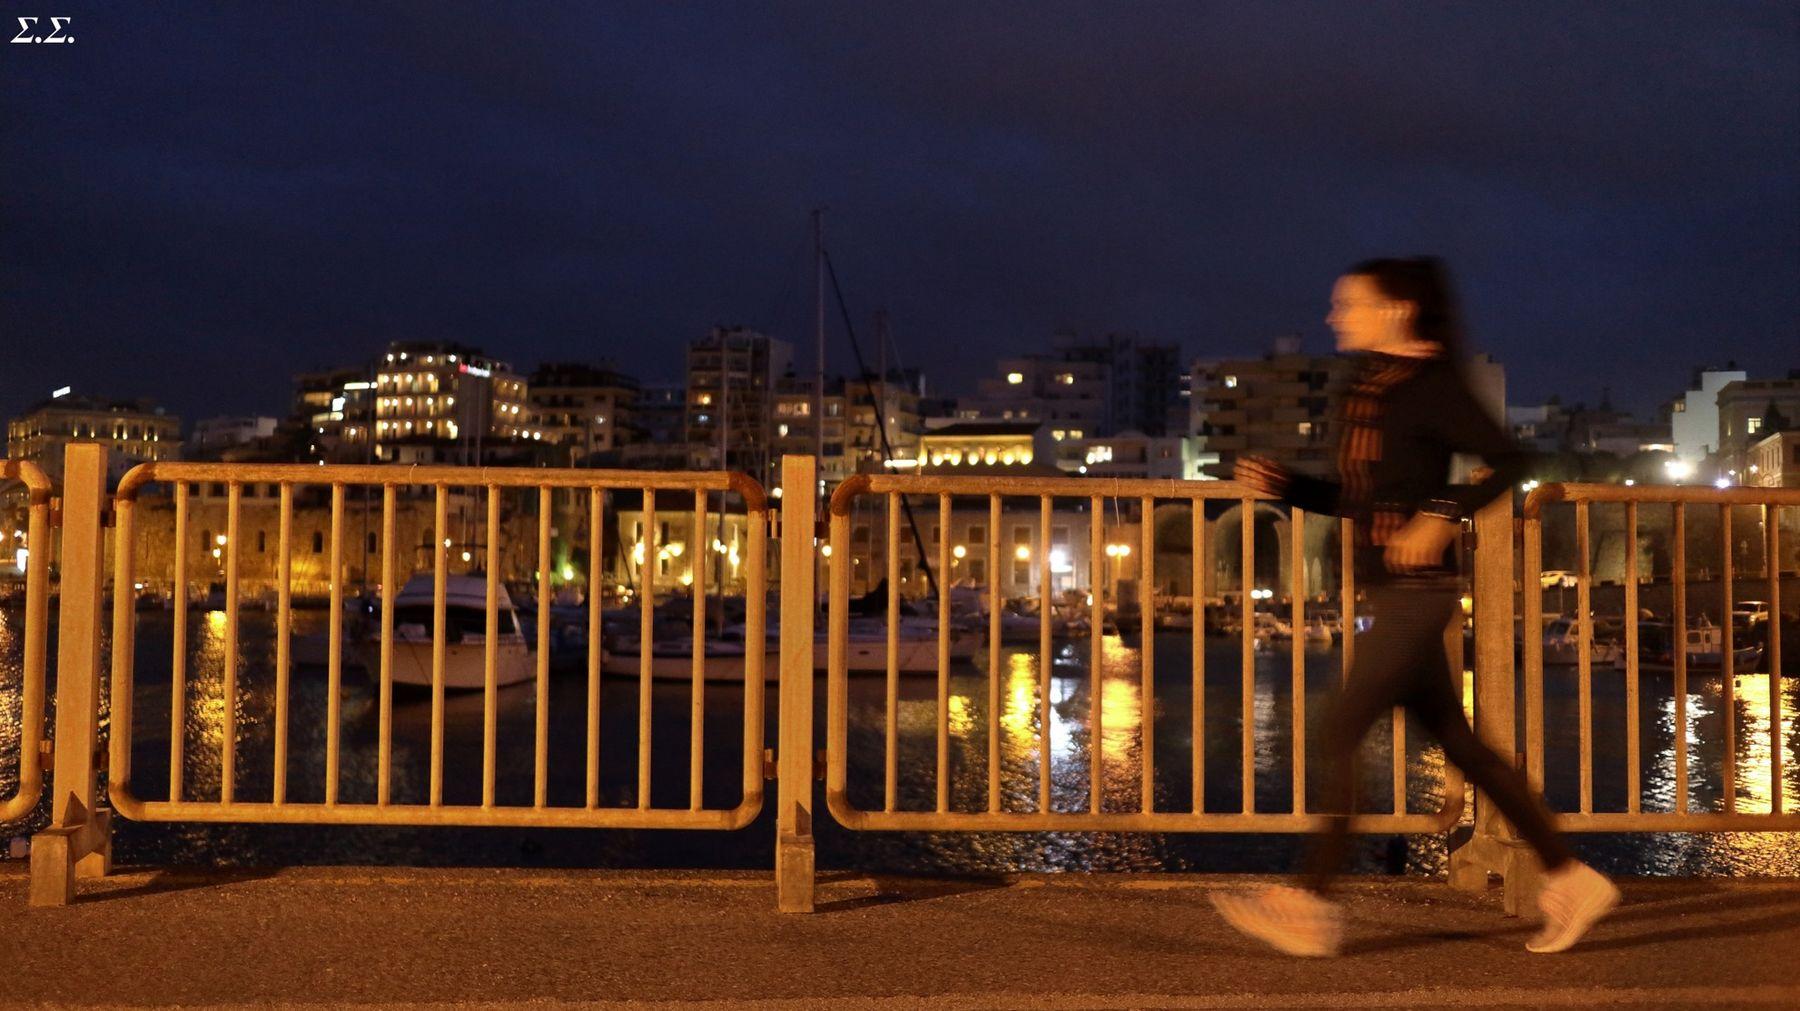 RUNNER IN THE NIGHT 1